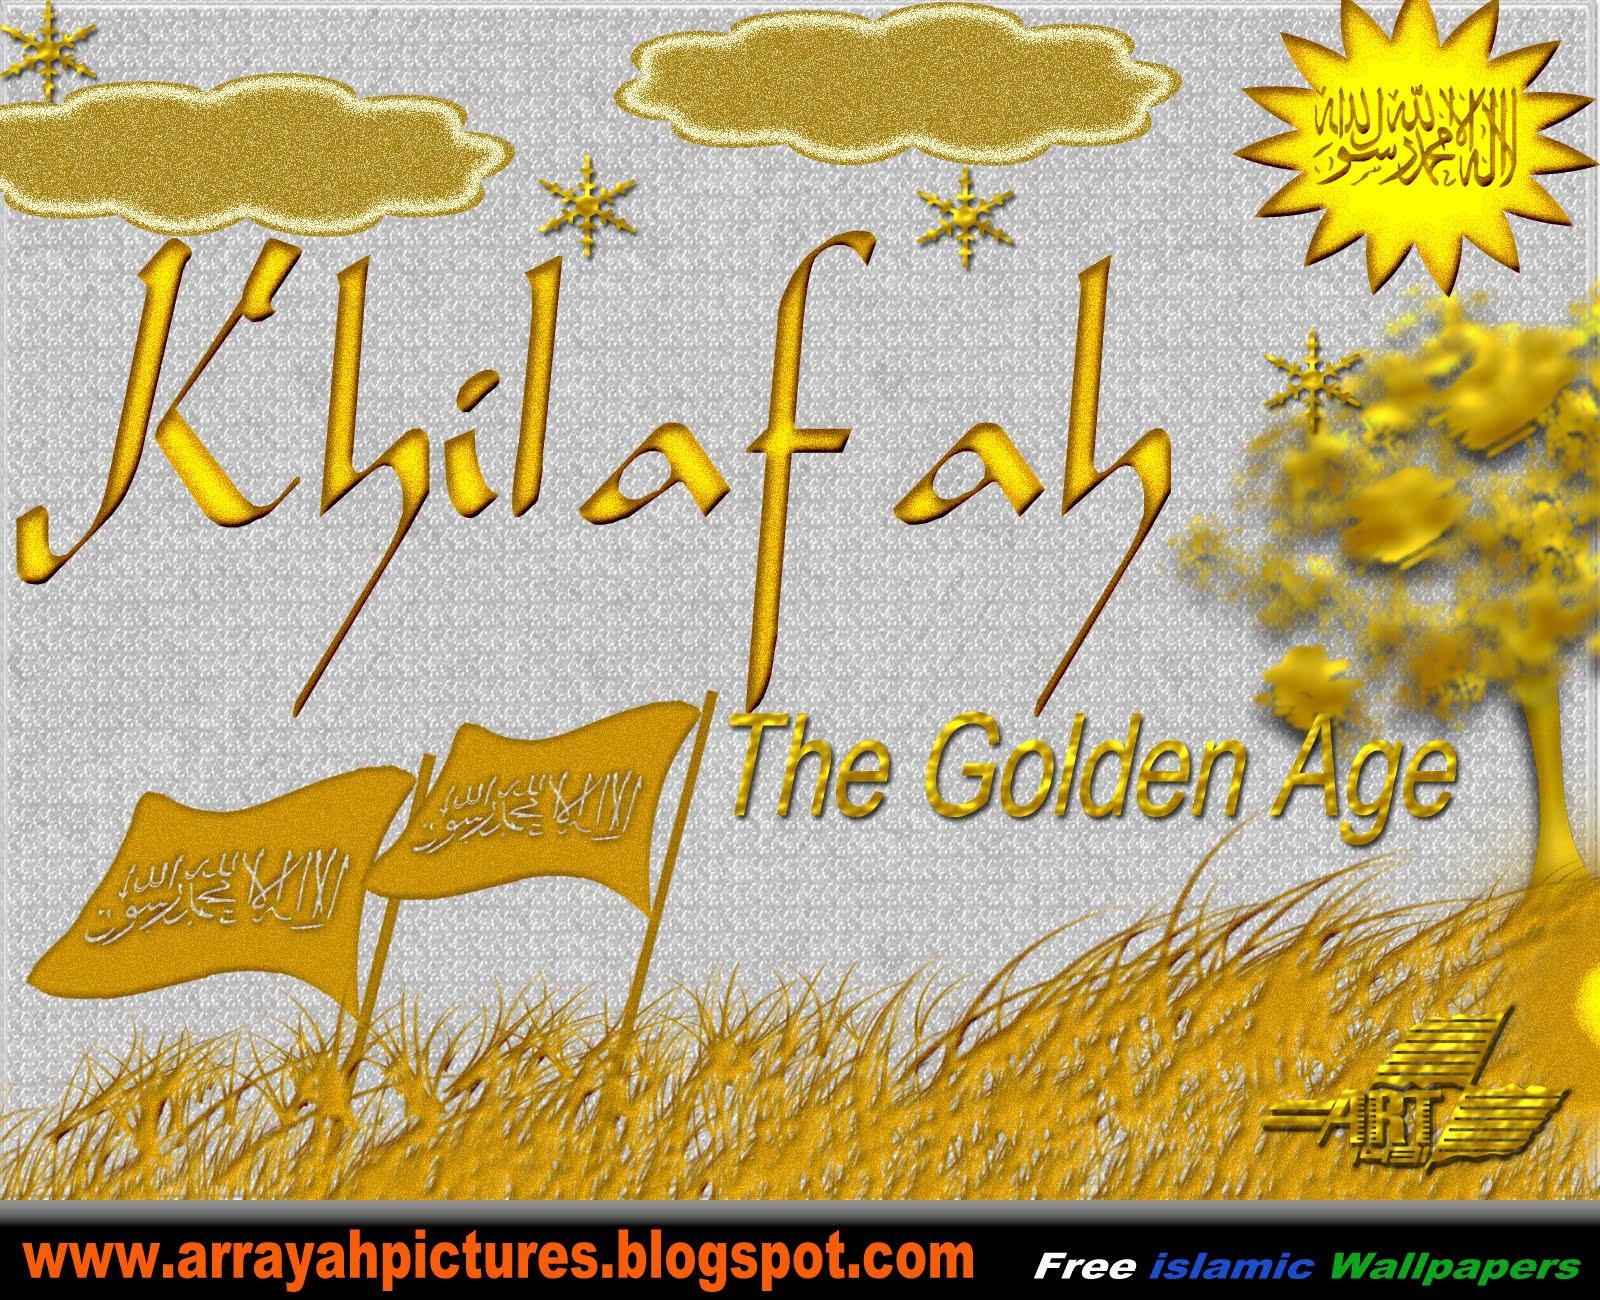 [0015+[=Z]+AR+RAYAH_VI+World_Under_One_Flag+''Golden+Age''.jpg]